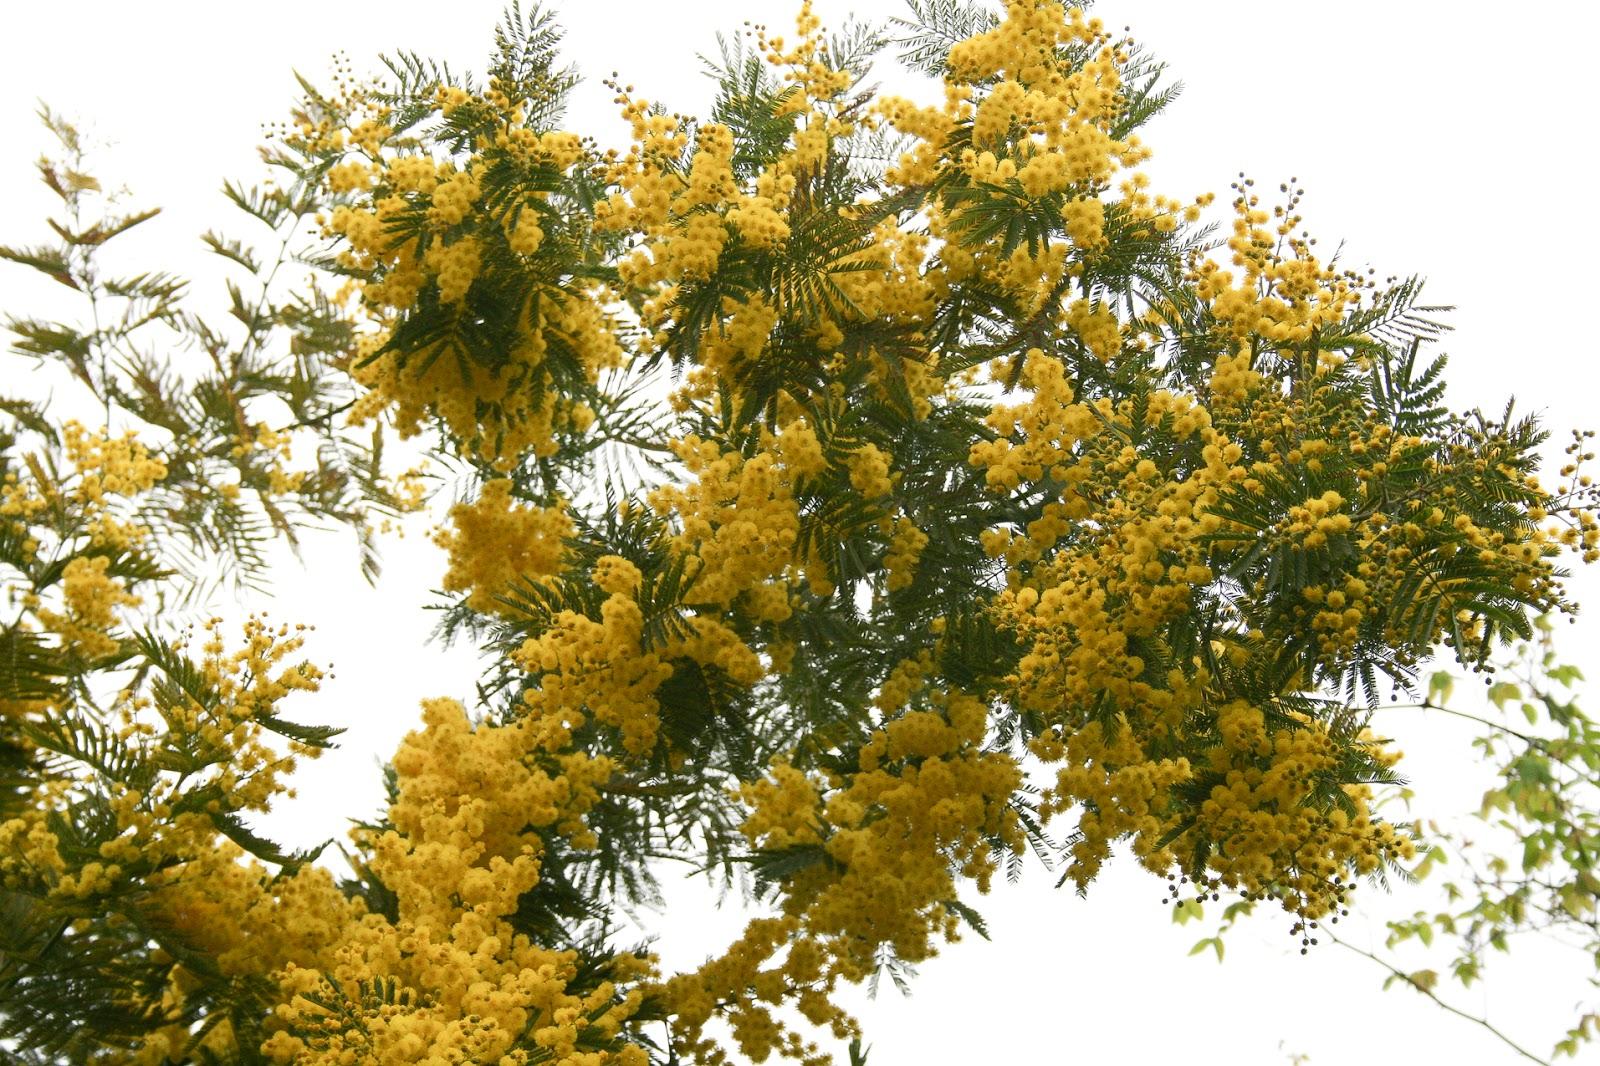 http://4.bp.blogspot.com/-dvLJRiFRWco/TZXOdsymbWI/AAAAAAAAAII/CW-WqBWFEr8/s1600/Mimosa.jpg